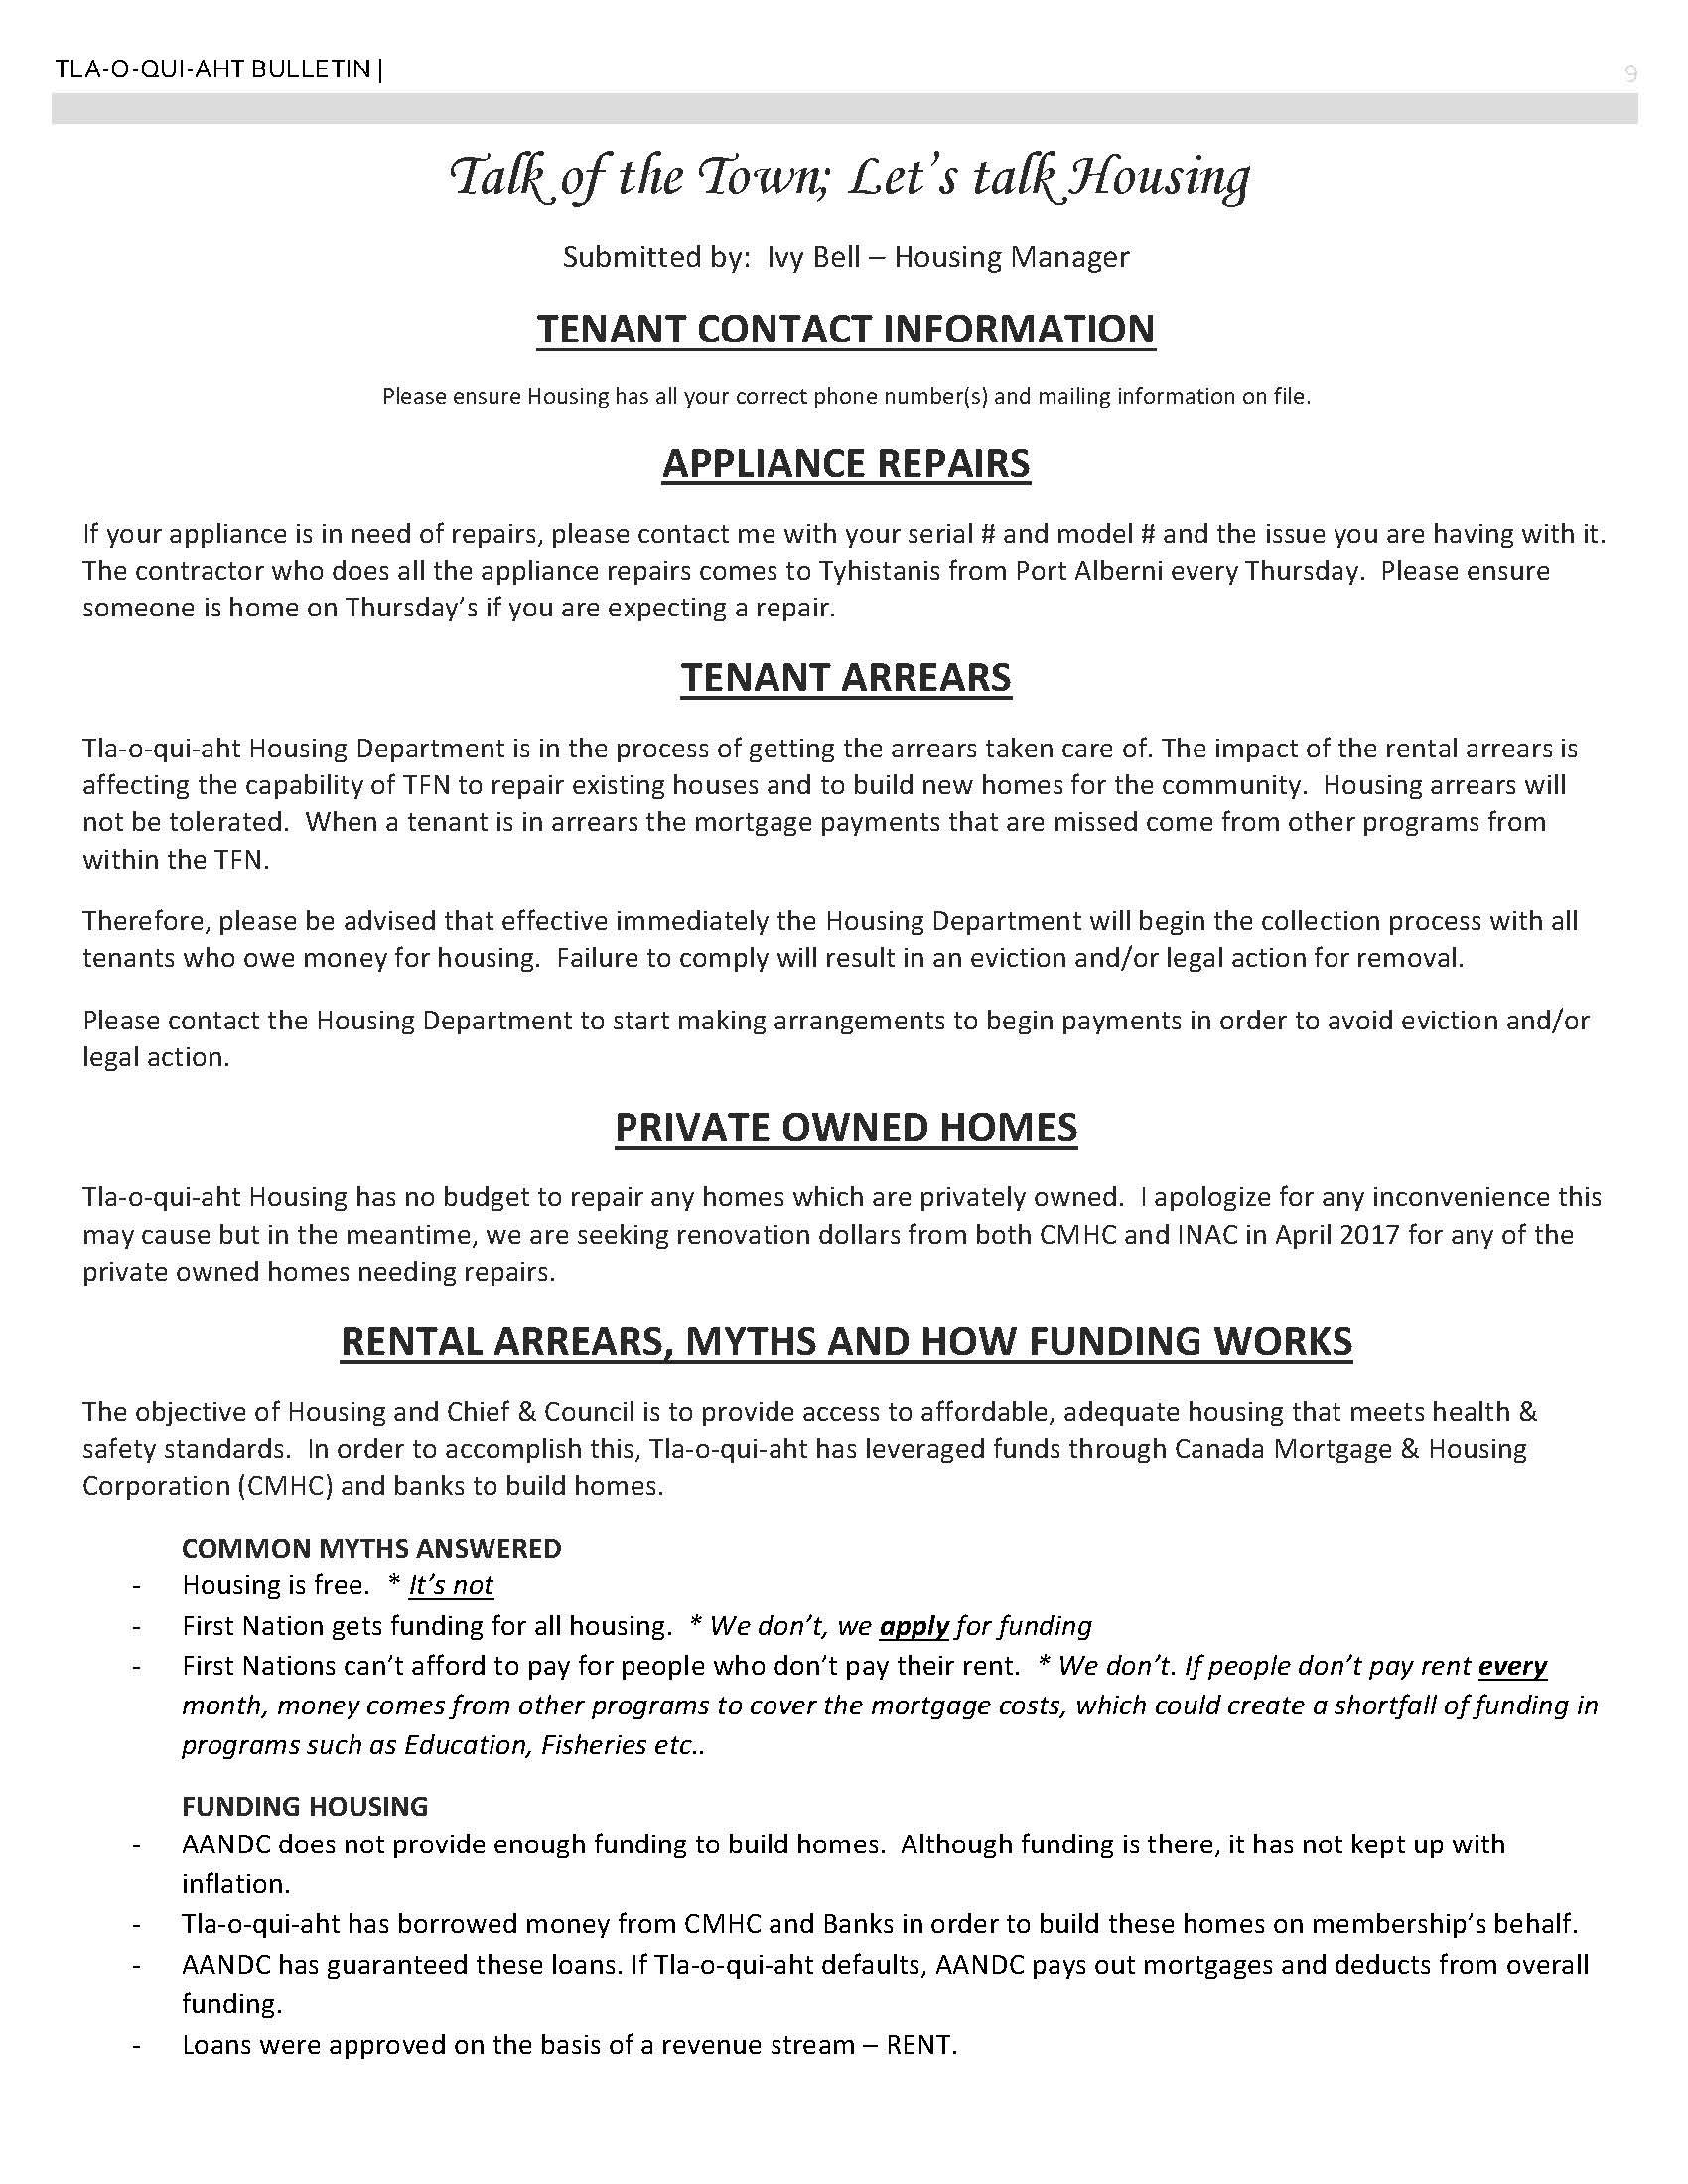 0TFN Bulletin Nov 15-2016_Page_09.jpg